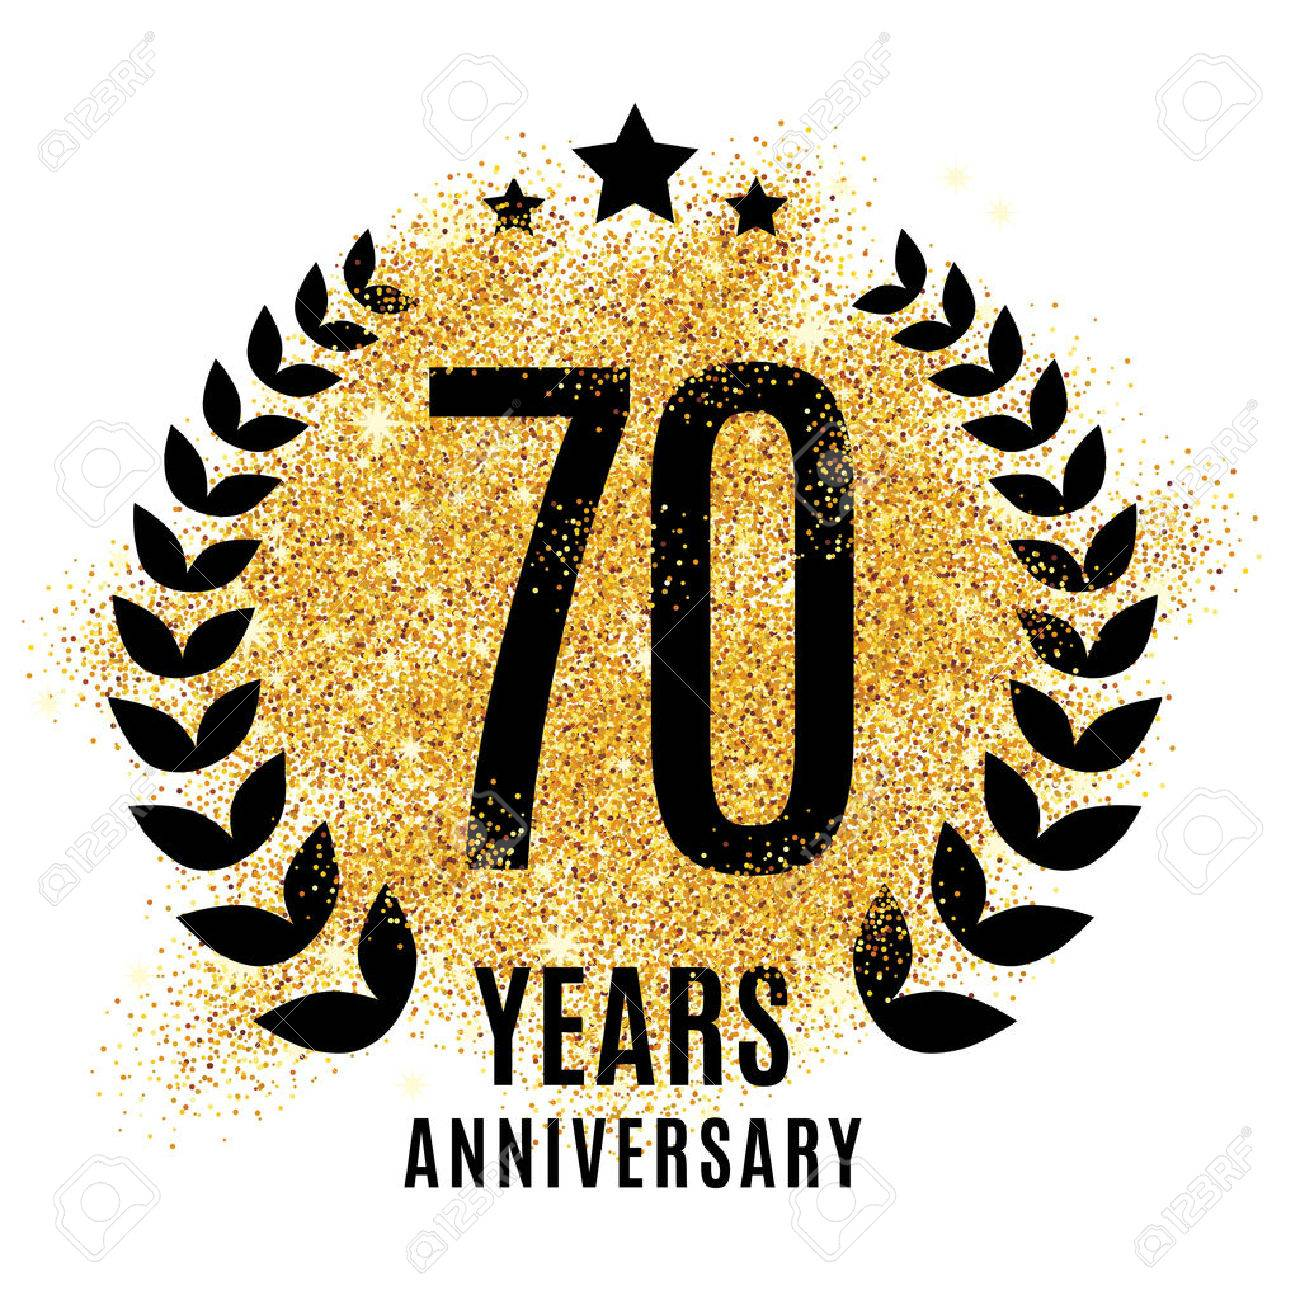 Seventy years golden anniversary sign. Gold glitter celebration. - 67586888